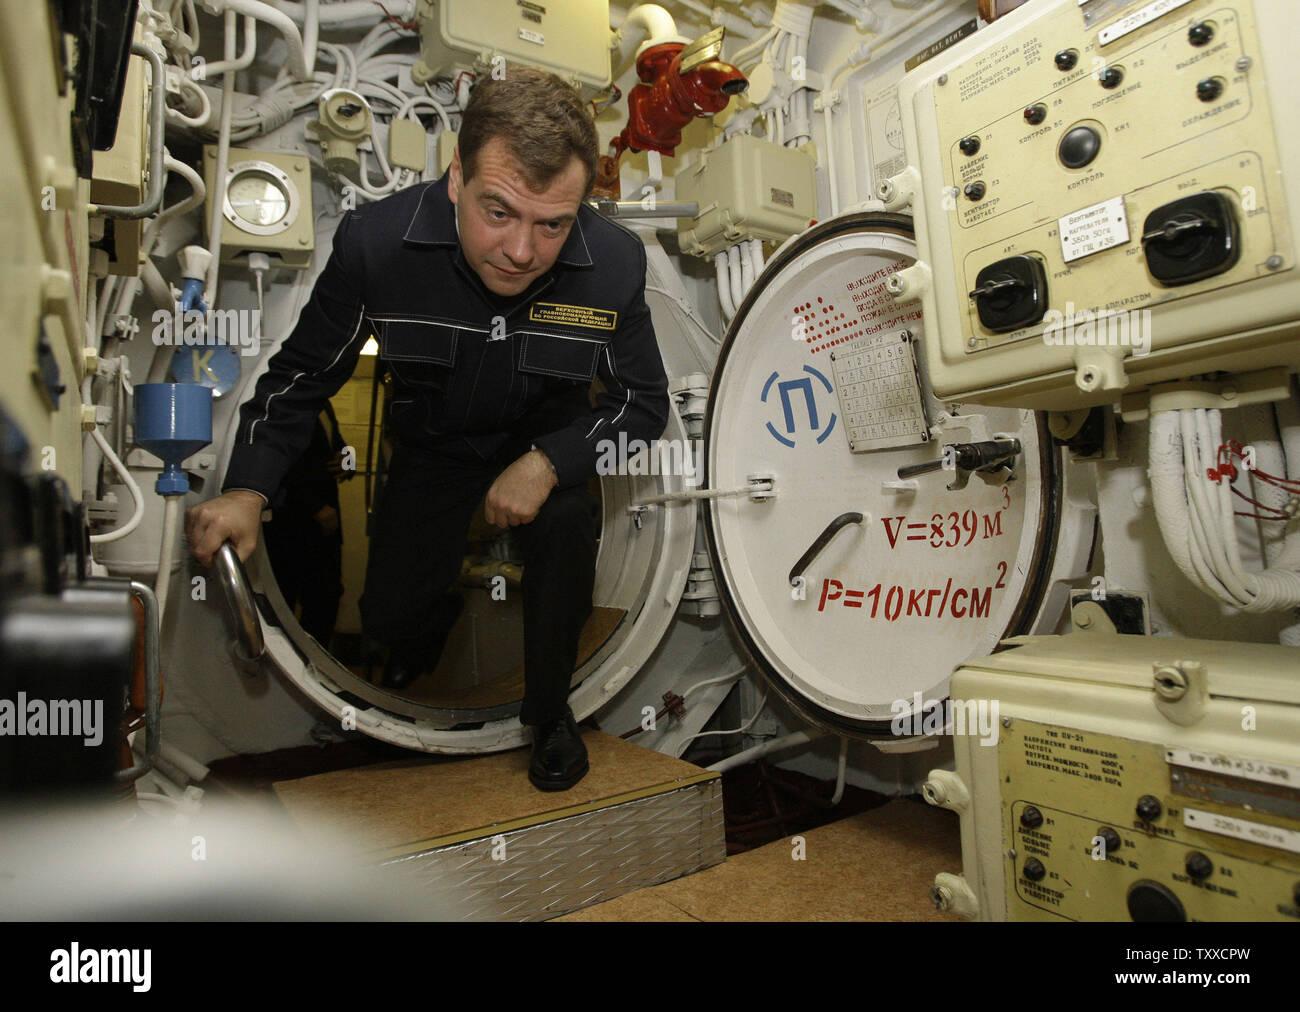 President Dmitry Medvedev wearing NAVY uniform visits the 'St. George the Victor' nuclear powered submarine at the Russian Pacific Fleet submarine base at Krasheninnikov Harbor on the Kamchatka Peninsula in the Russian Far East on September 25, 2008. (UPI Photo/Anatoli Zhdanov) - Stock Image